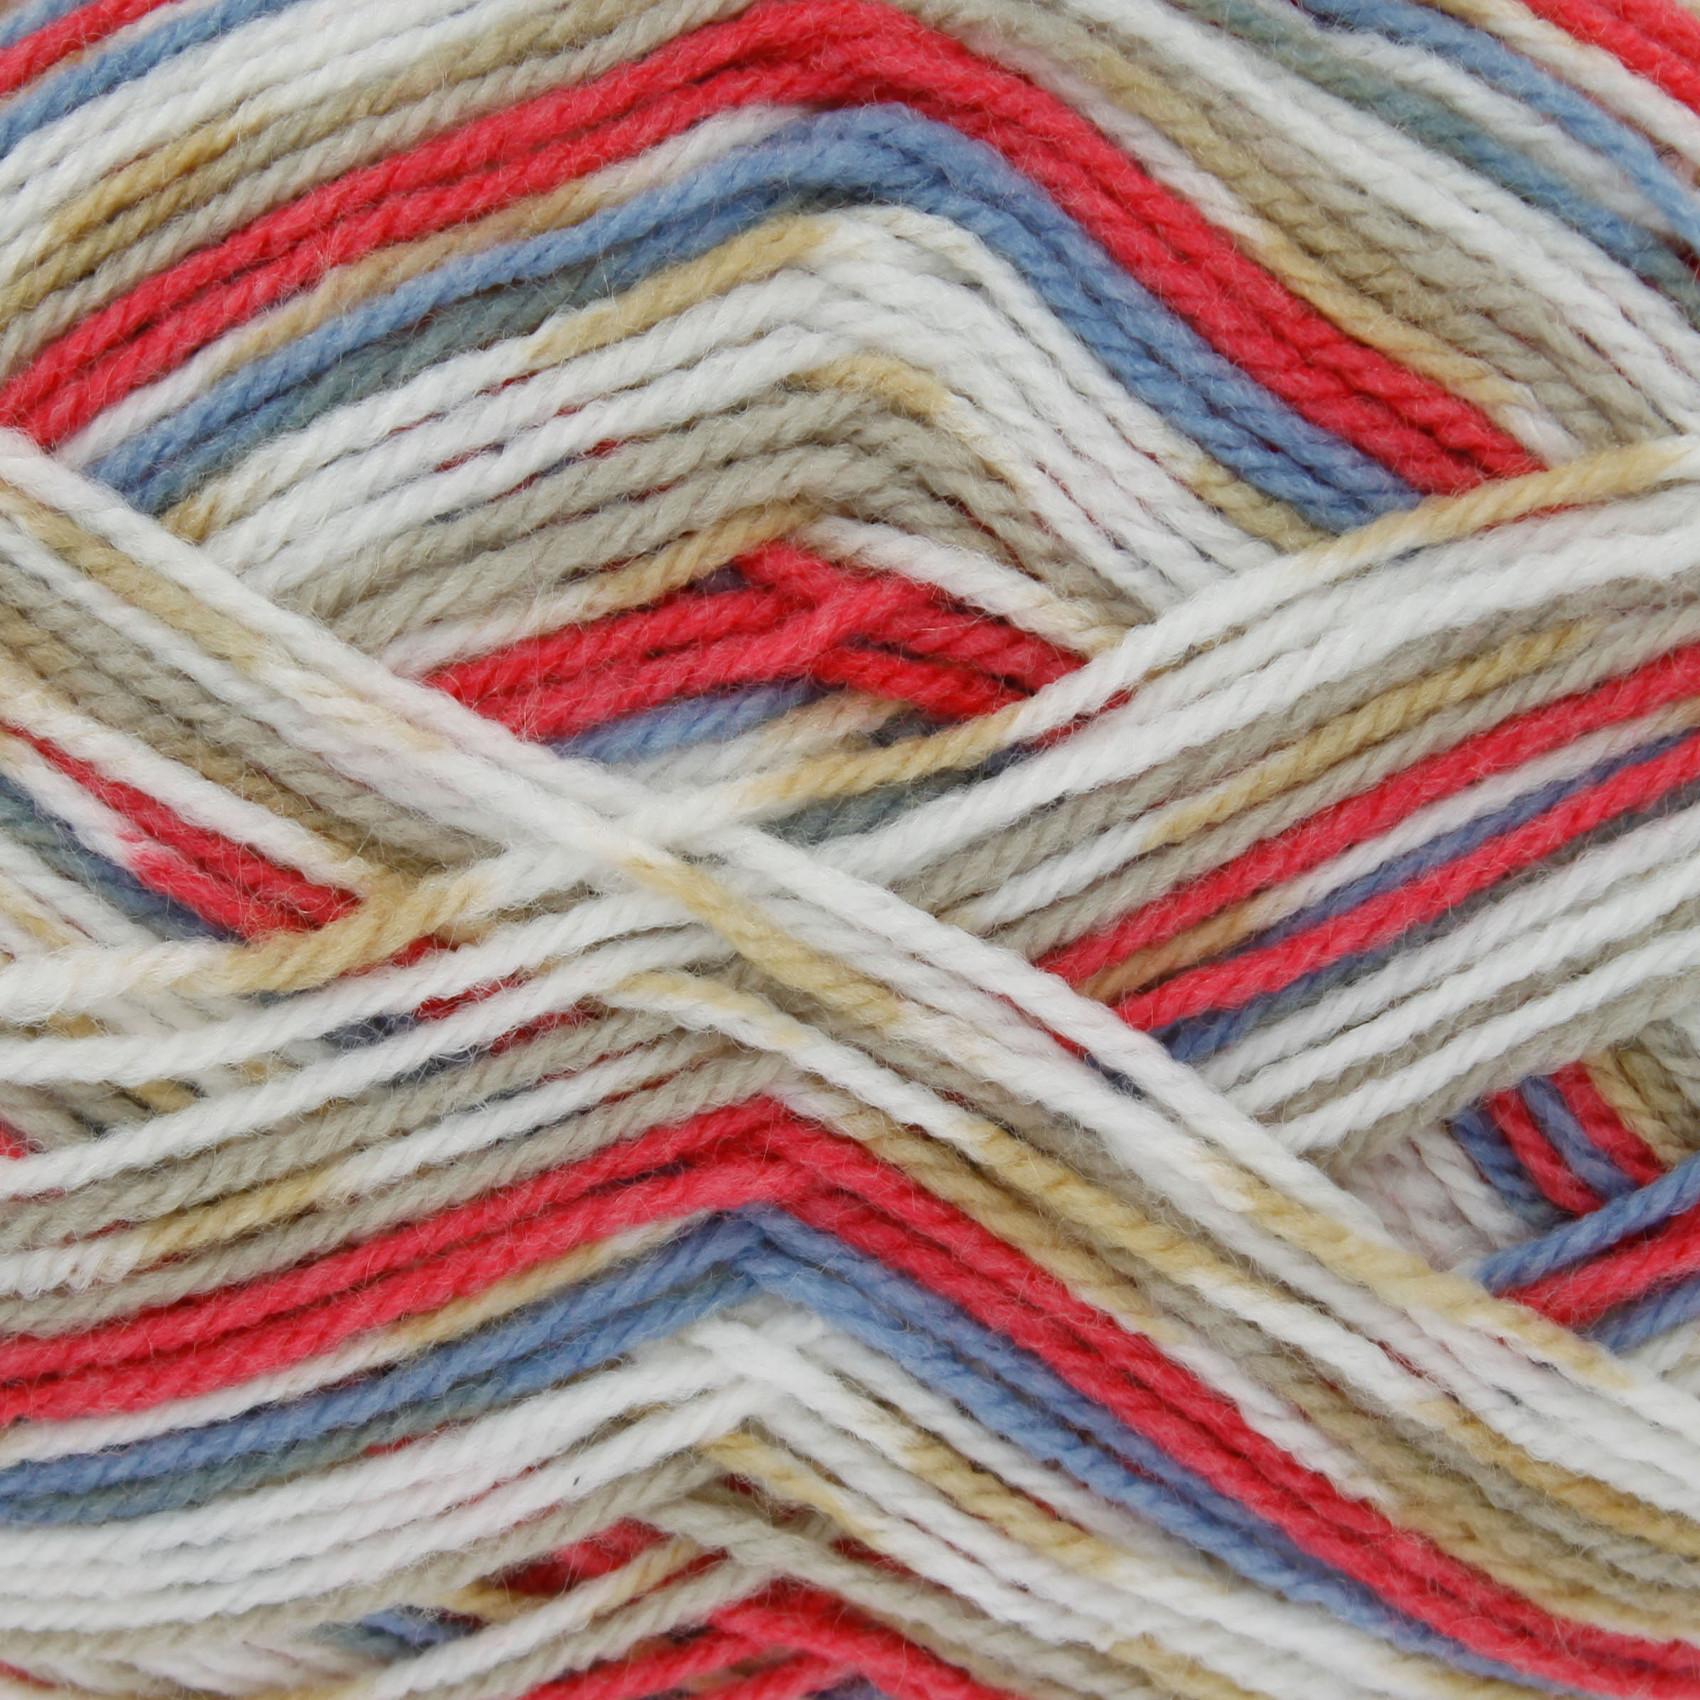 Knitting Yarn Design : Double knit g ball comfort prints dk yarn king cole